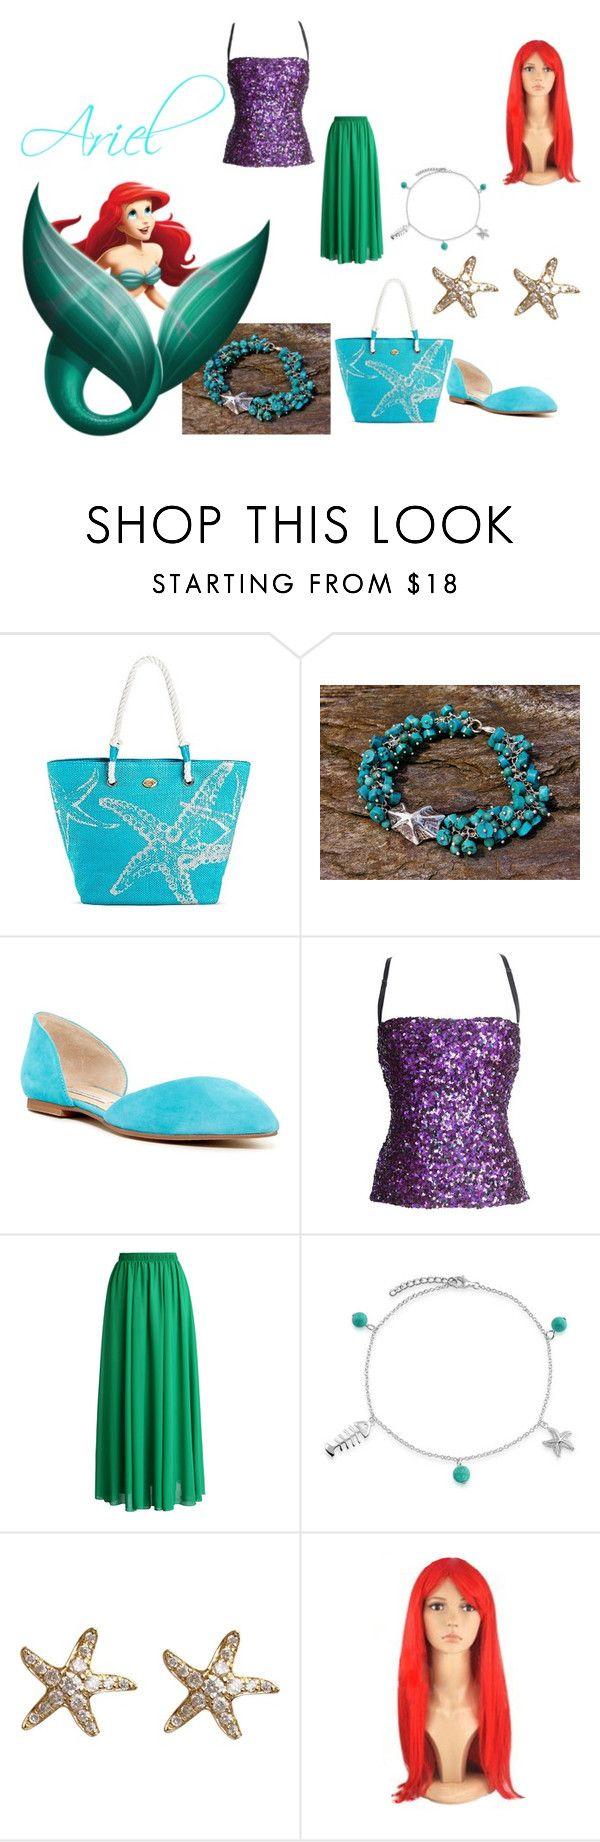 """Ariel"" by mandalinaqitrydewi on Polyvore featuring Dolce&Gabbana, Chicwish, Bling Jewelry and Annoushka"